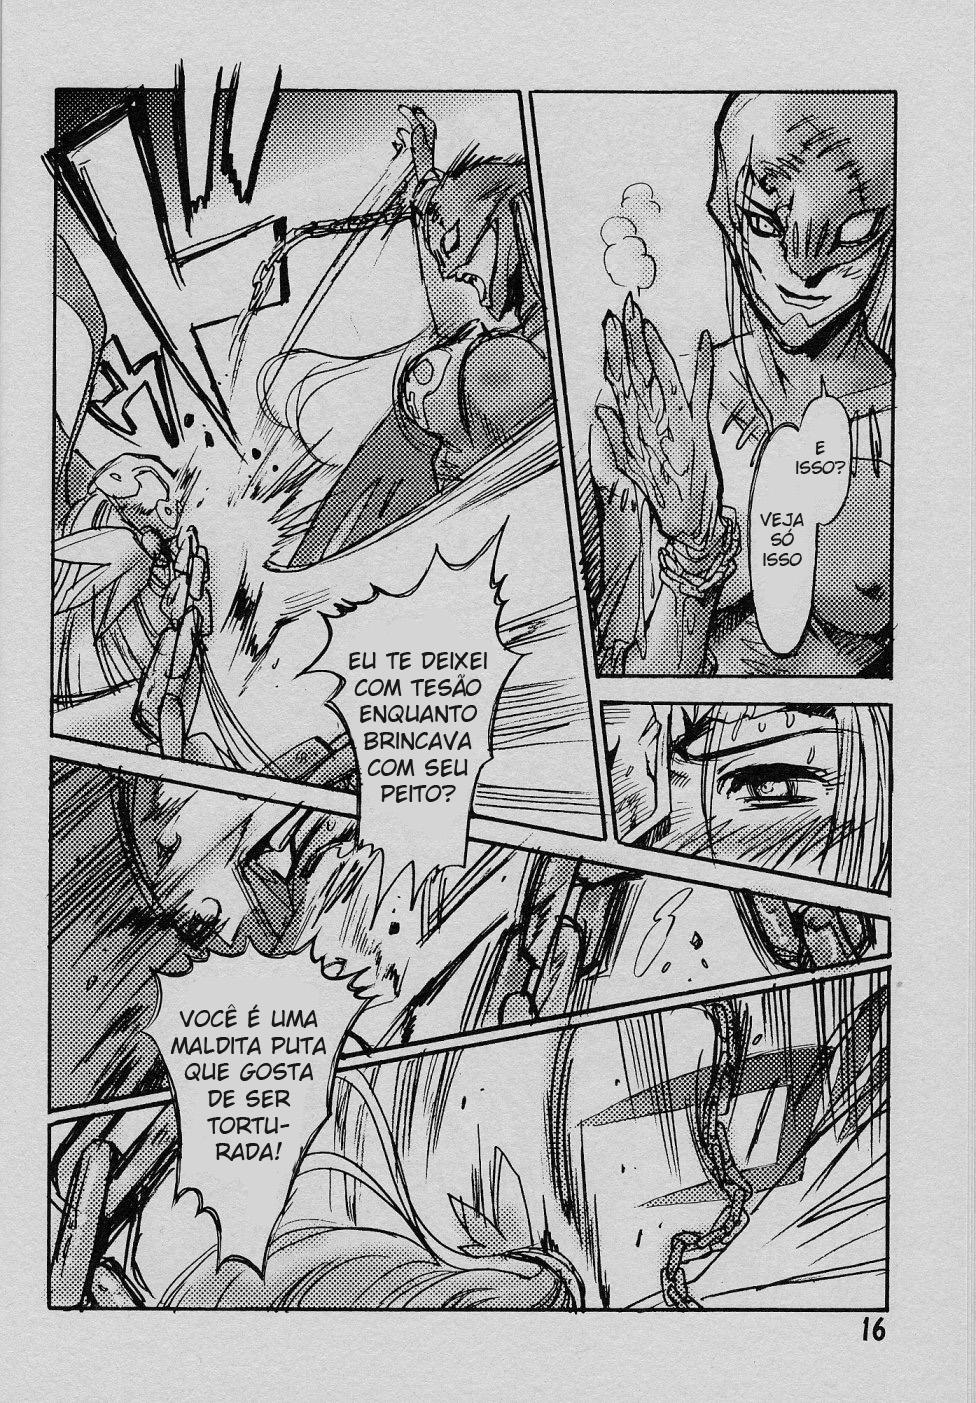 Digimon Hentai Pornô: O anjo caído - Foto 15